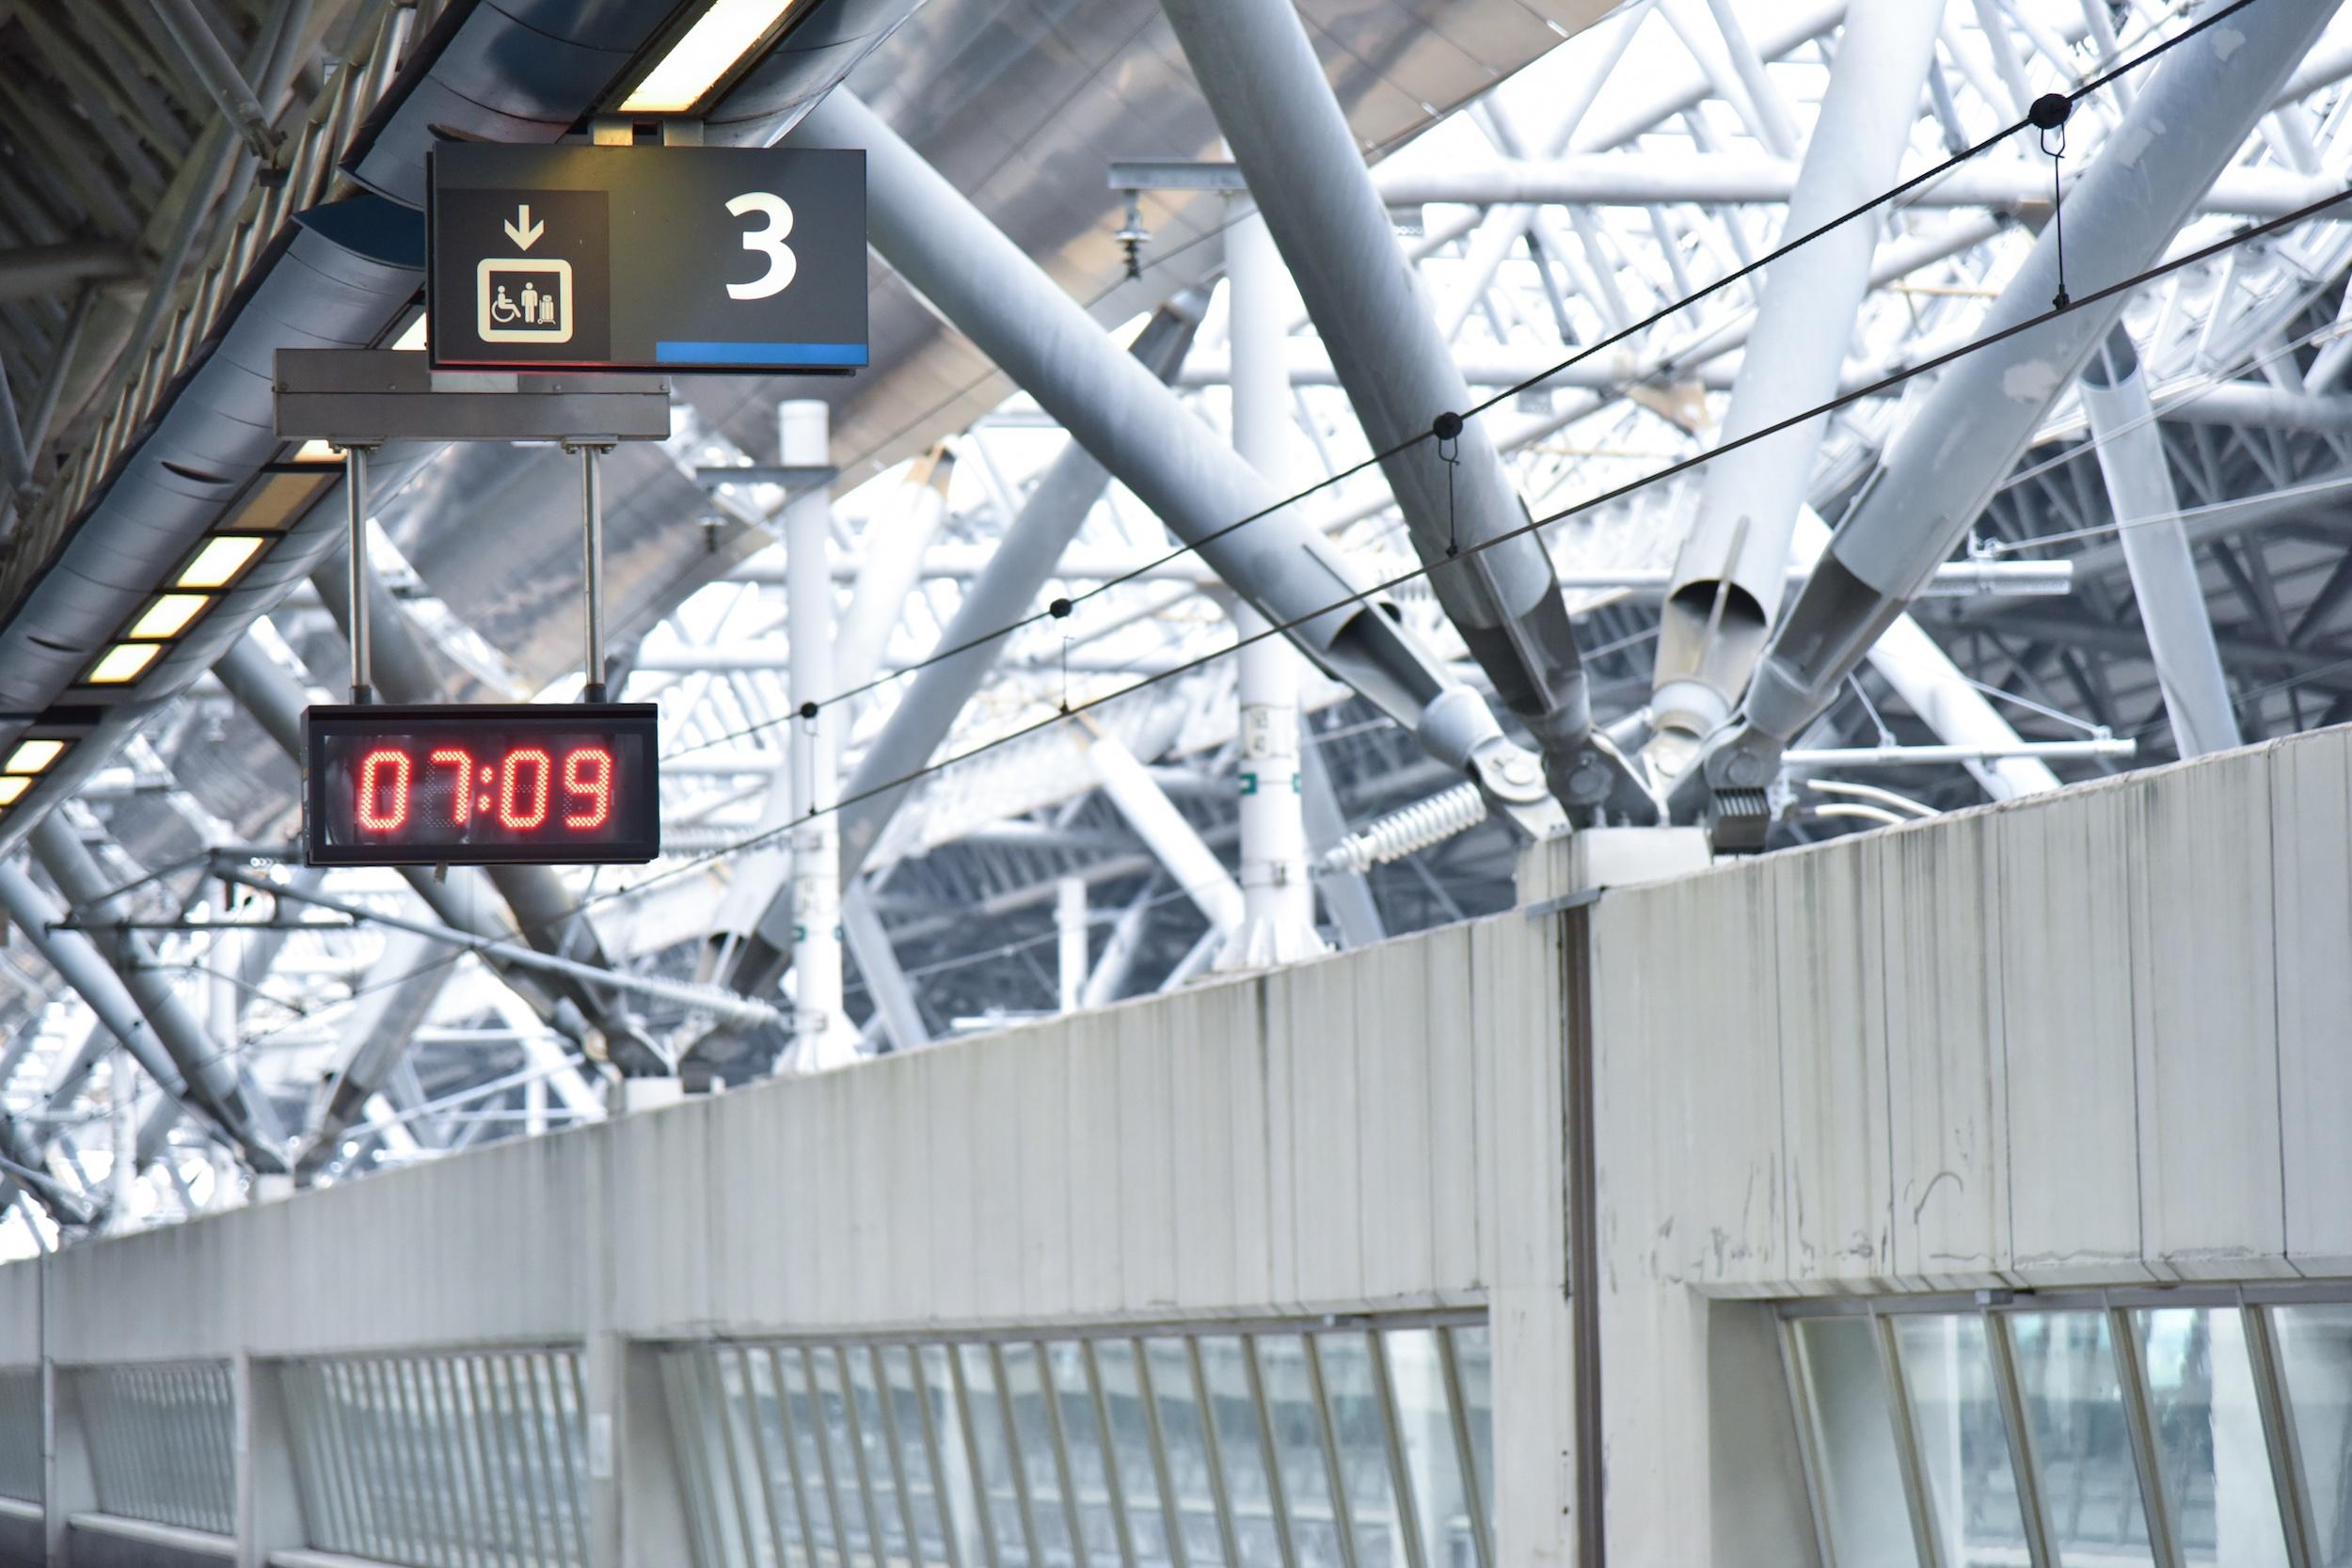 Digital clock displaying